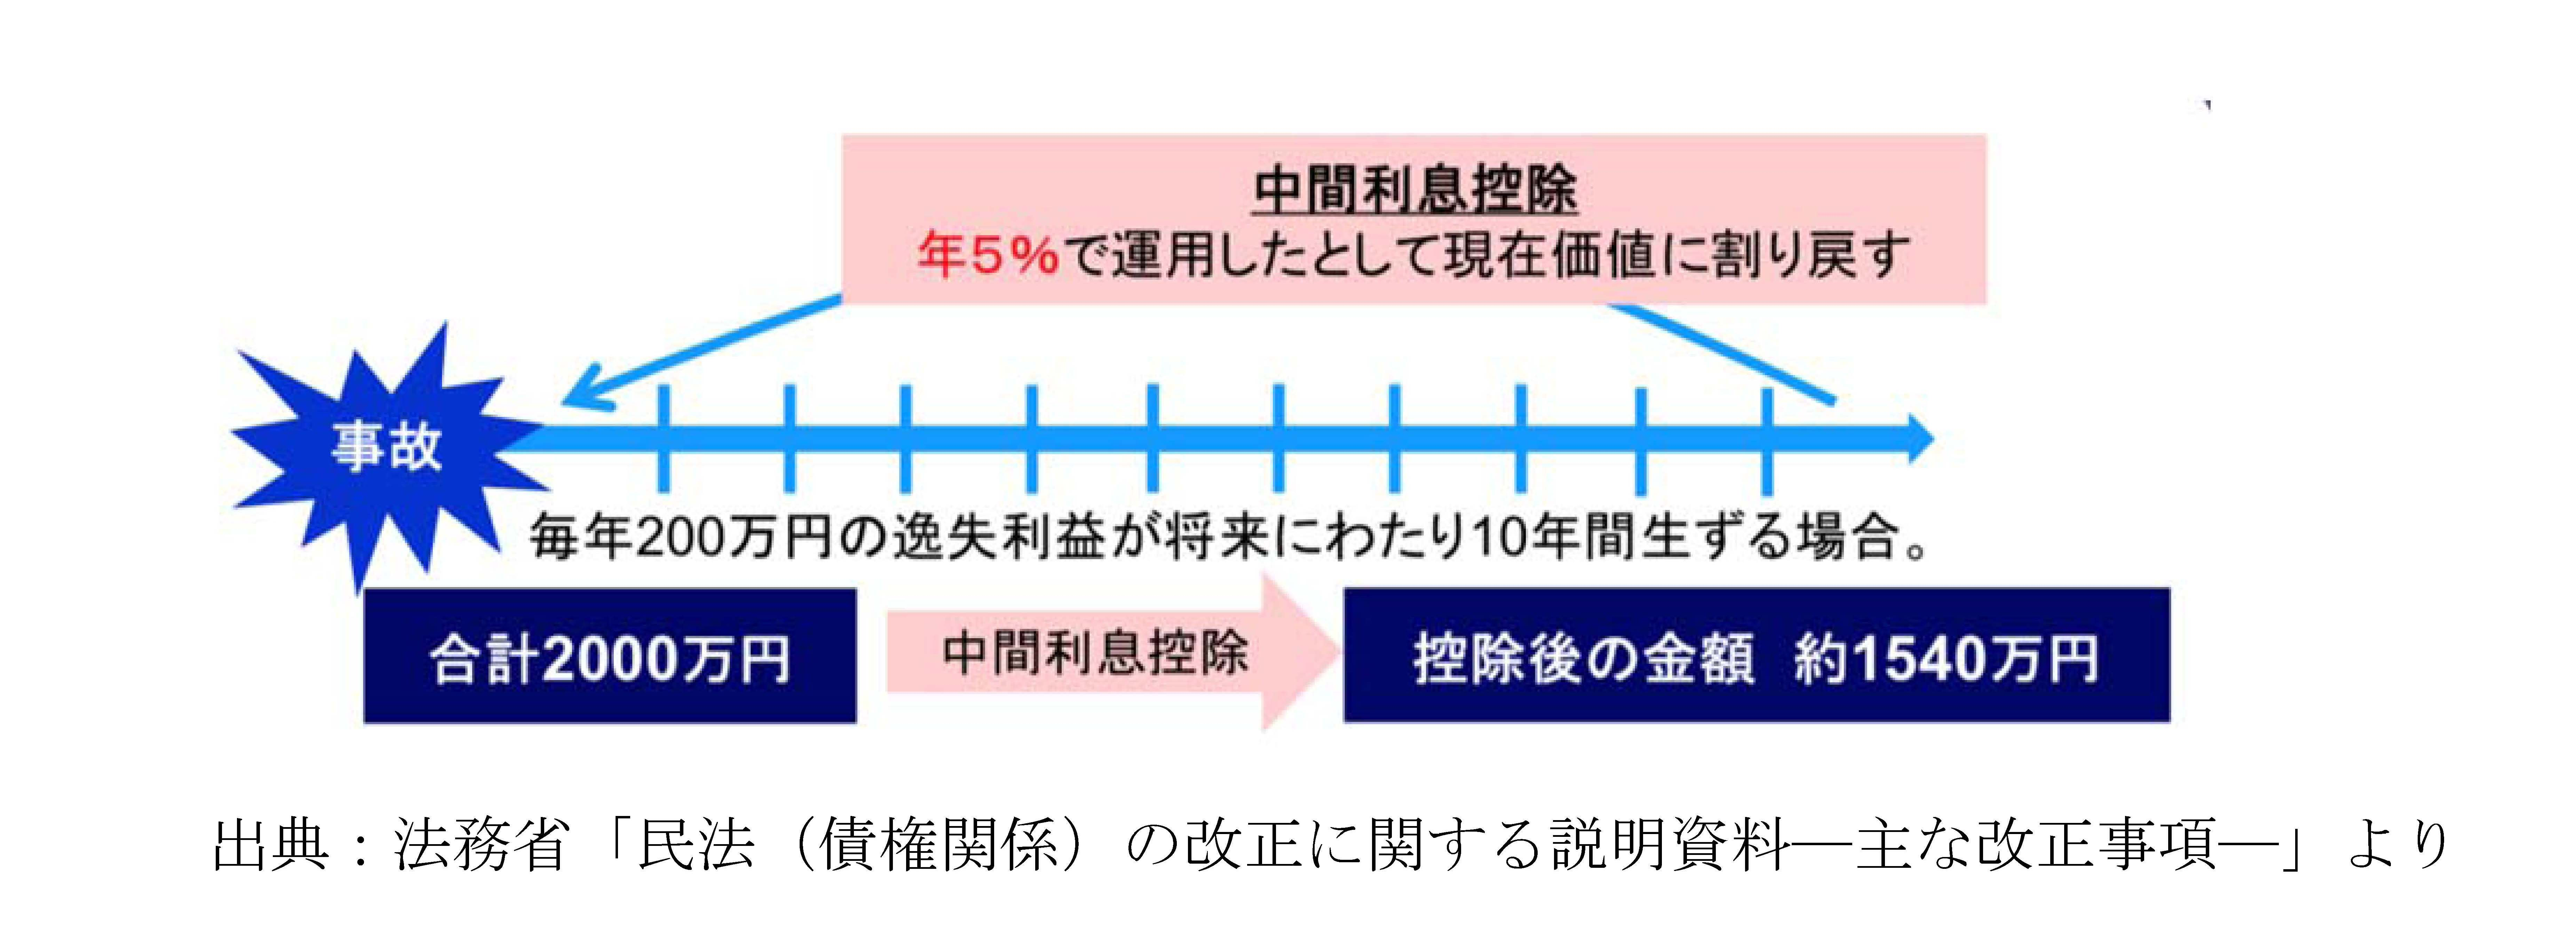 chukanrisoku_zuhyo.jpg